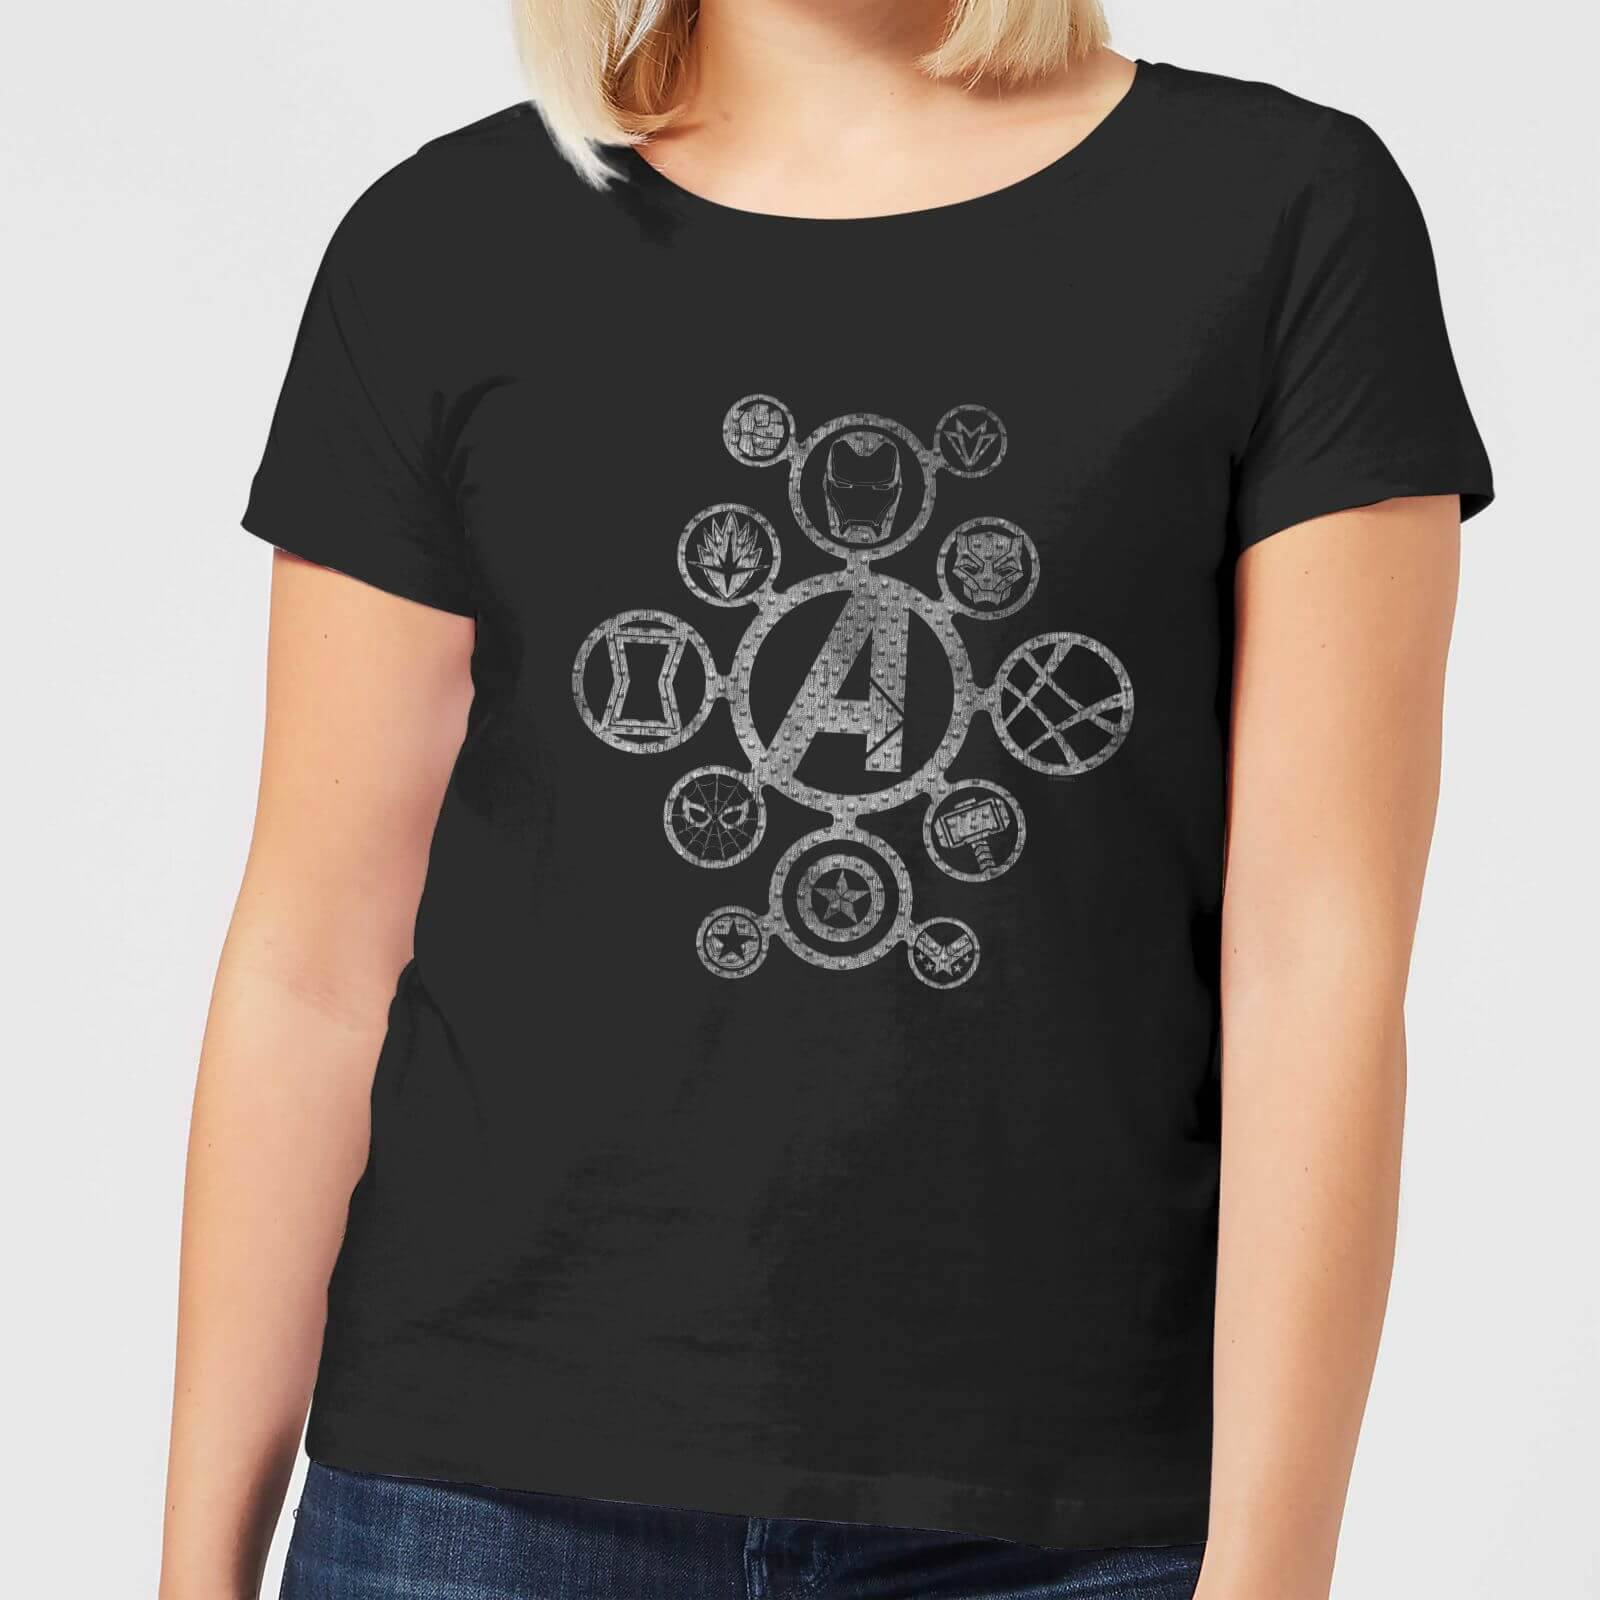 Marvel Avengers Distressed Metal Icon Women's T-Shirt - Black - XS - Black